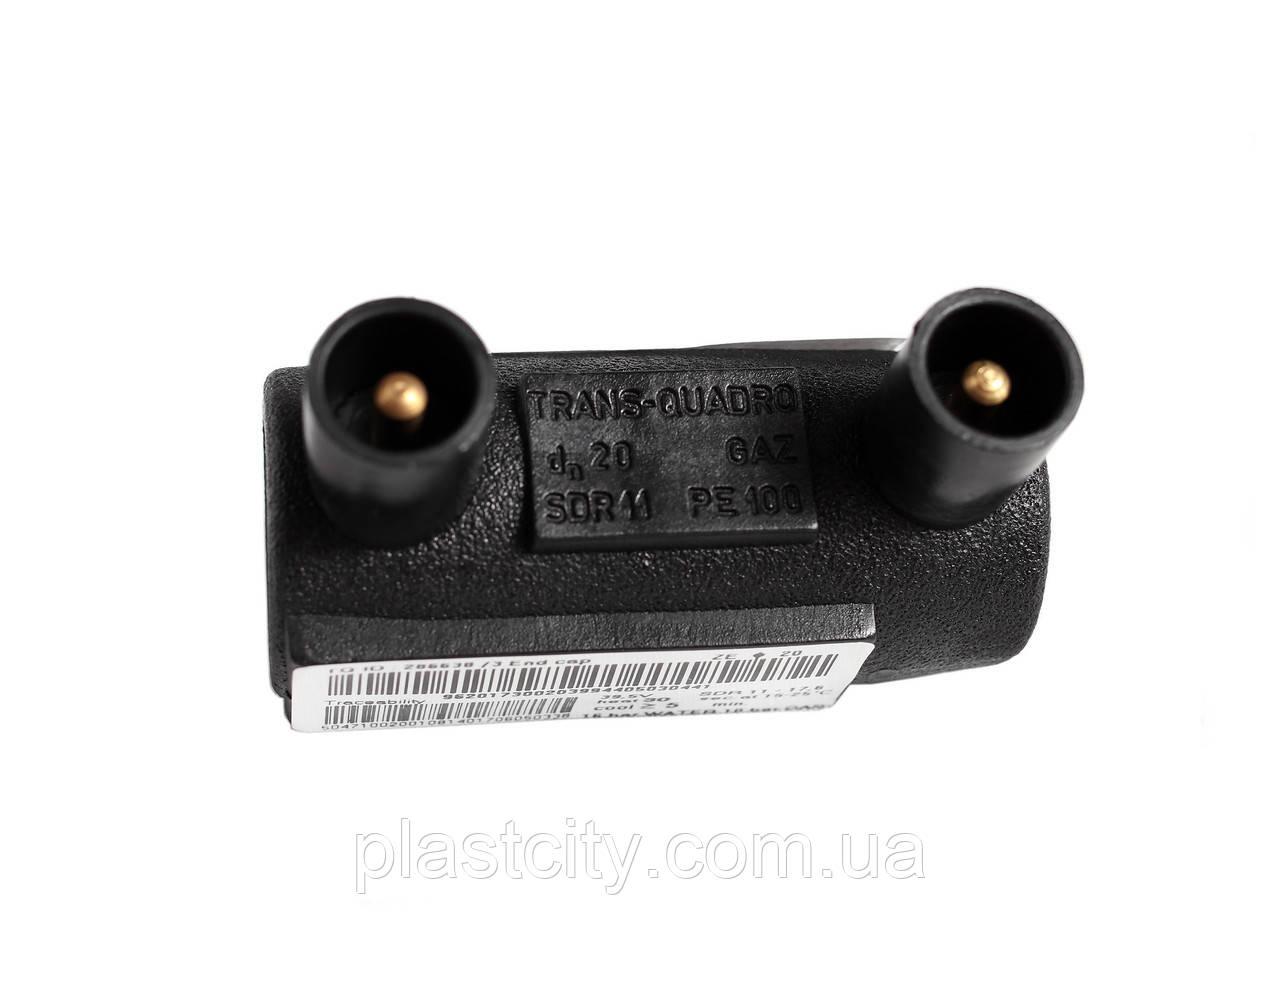 Муфта терморезисторная 160 мм ПЭ100 SDR11